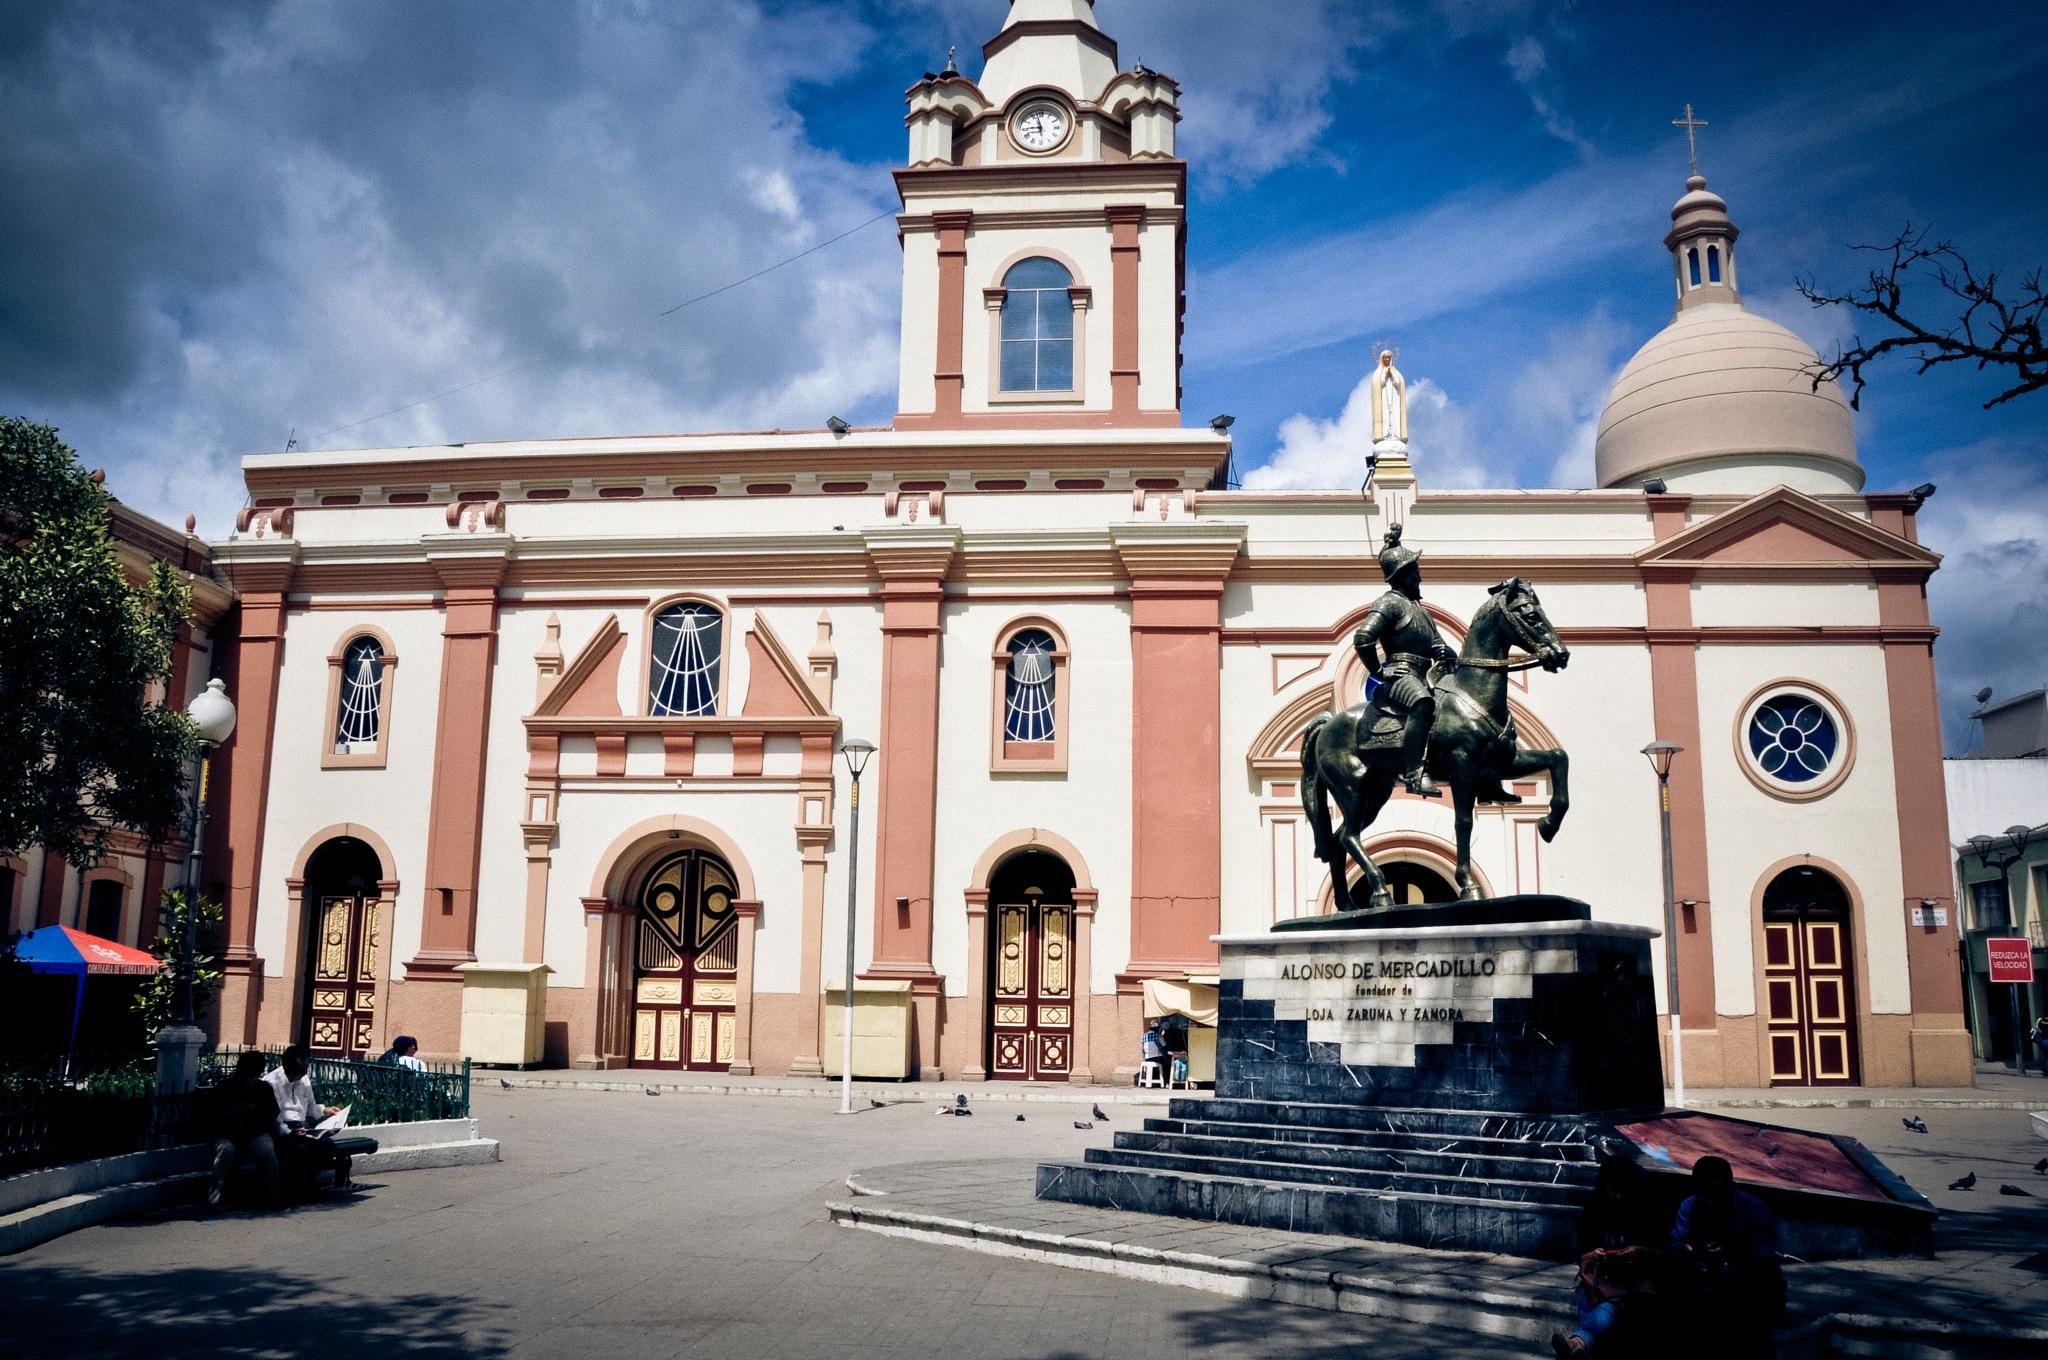 Iglesia de San Francisco Church, Loja (Ecuador) by Jiri Bielicky